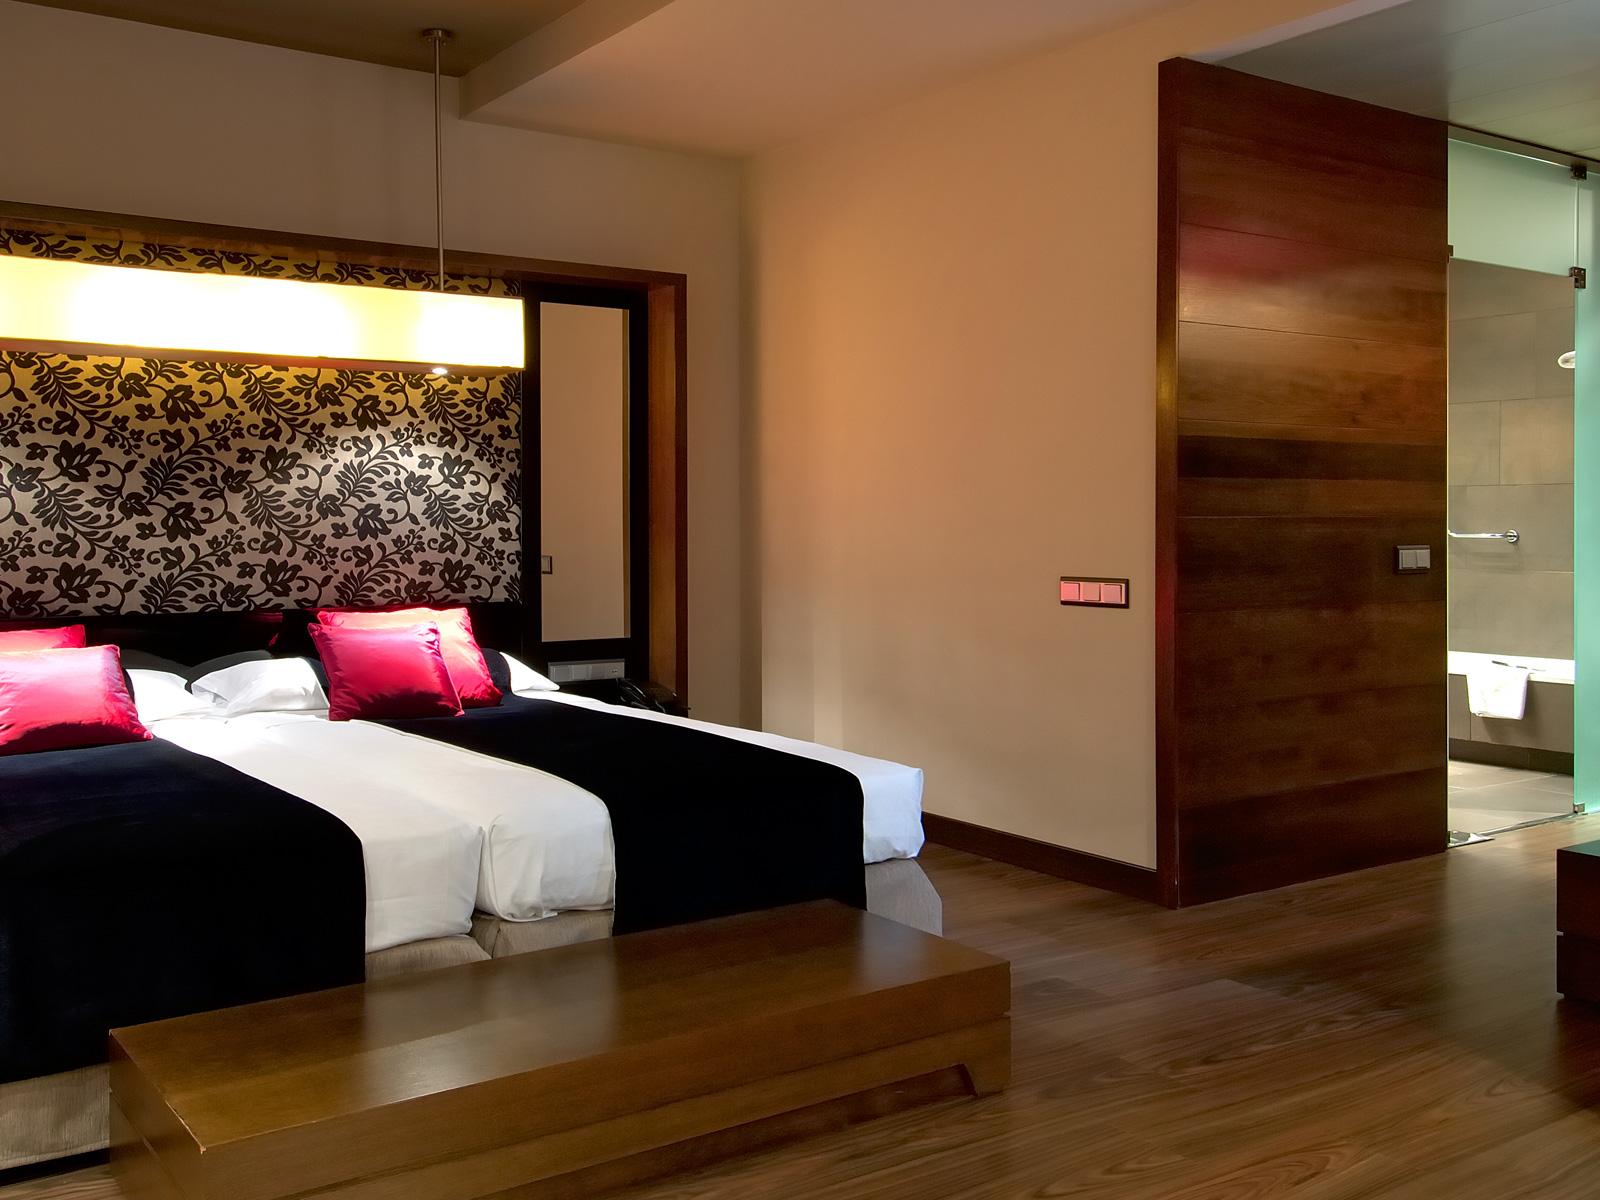 Rooms Hotel Madrid Soho - Vincci Hotels - Executive Room